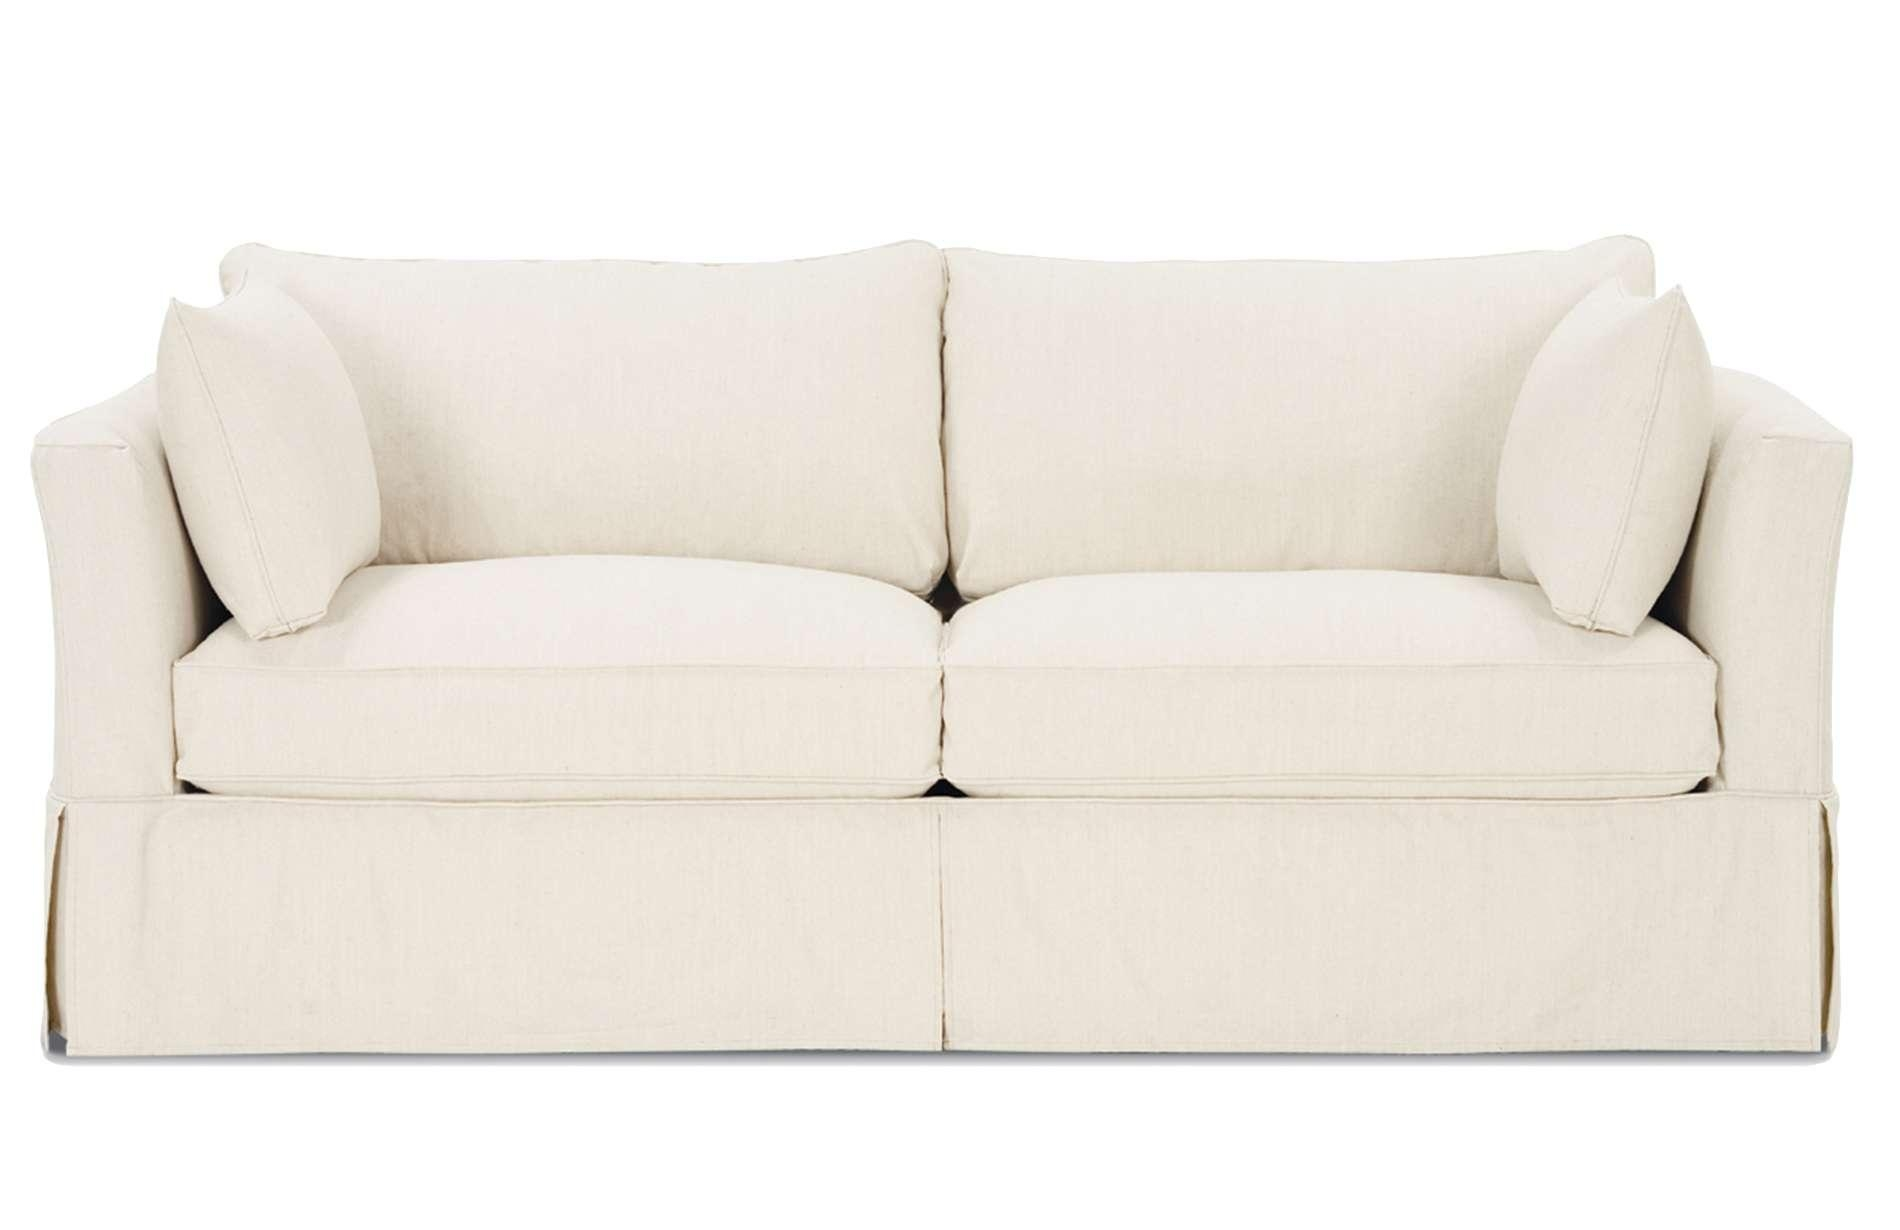 Sofa Slipcovers, Ottoman Slipcovers, Sectional Slipcovers | Rowe In Slipcovers For Chairs And Sofas (Image 19 of 20)